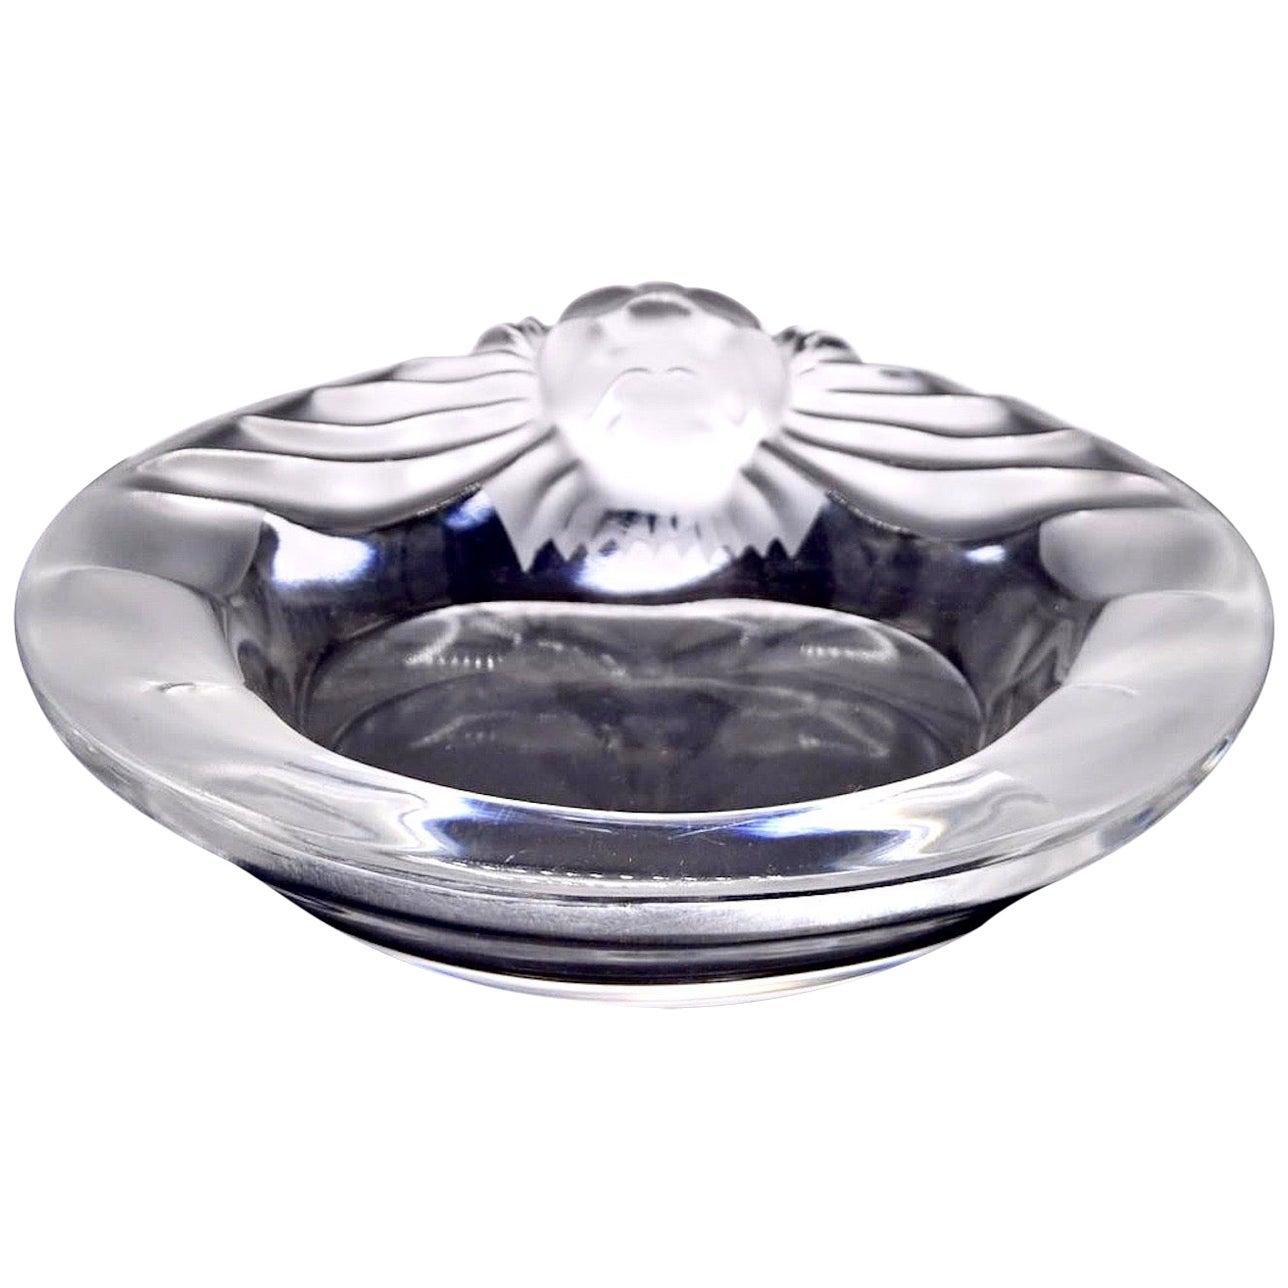 Lalique Vintage Lion Crystal Bowl, Clear Basin, Dish, Ashtray, Signed